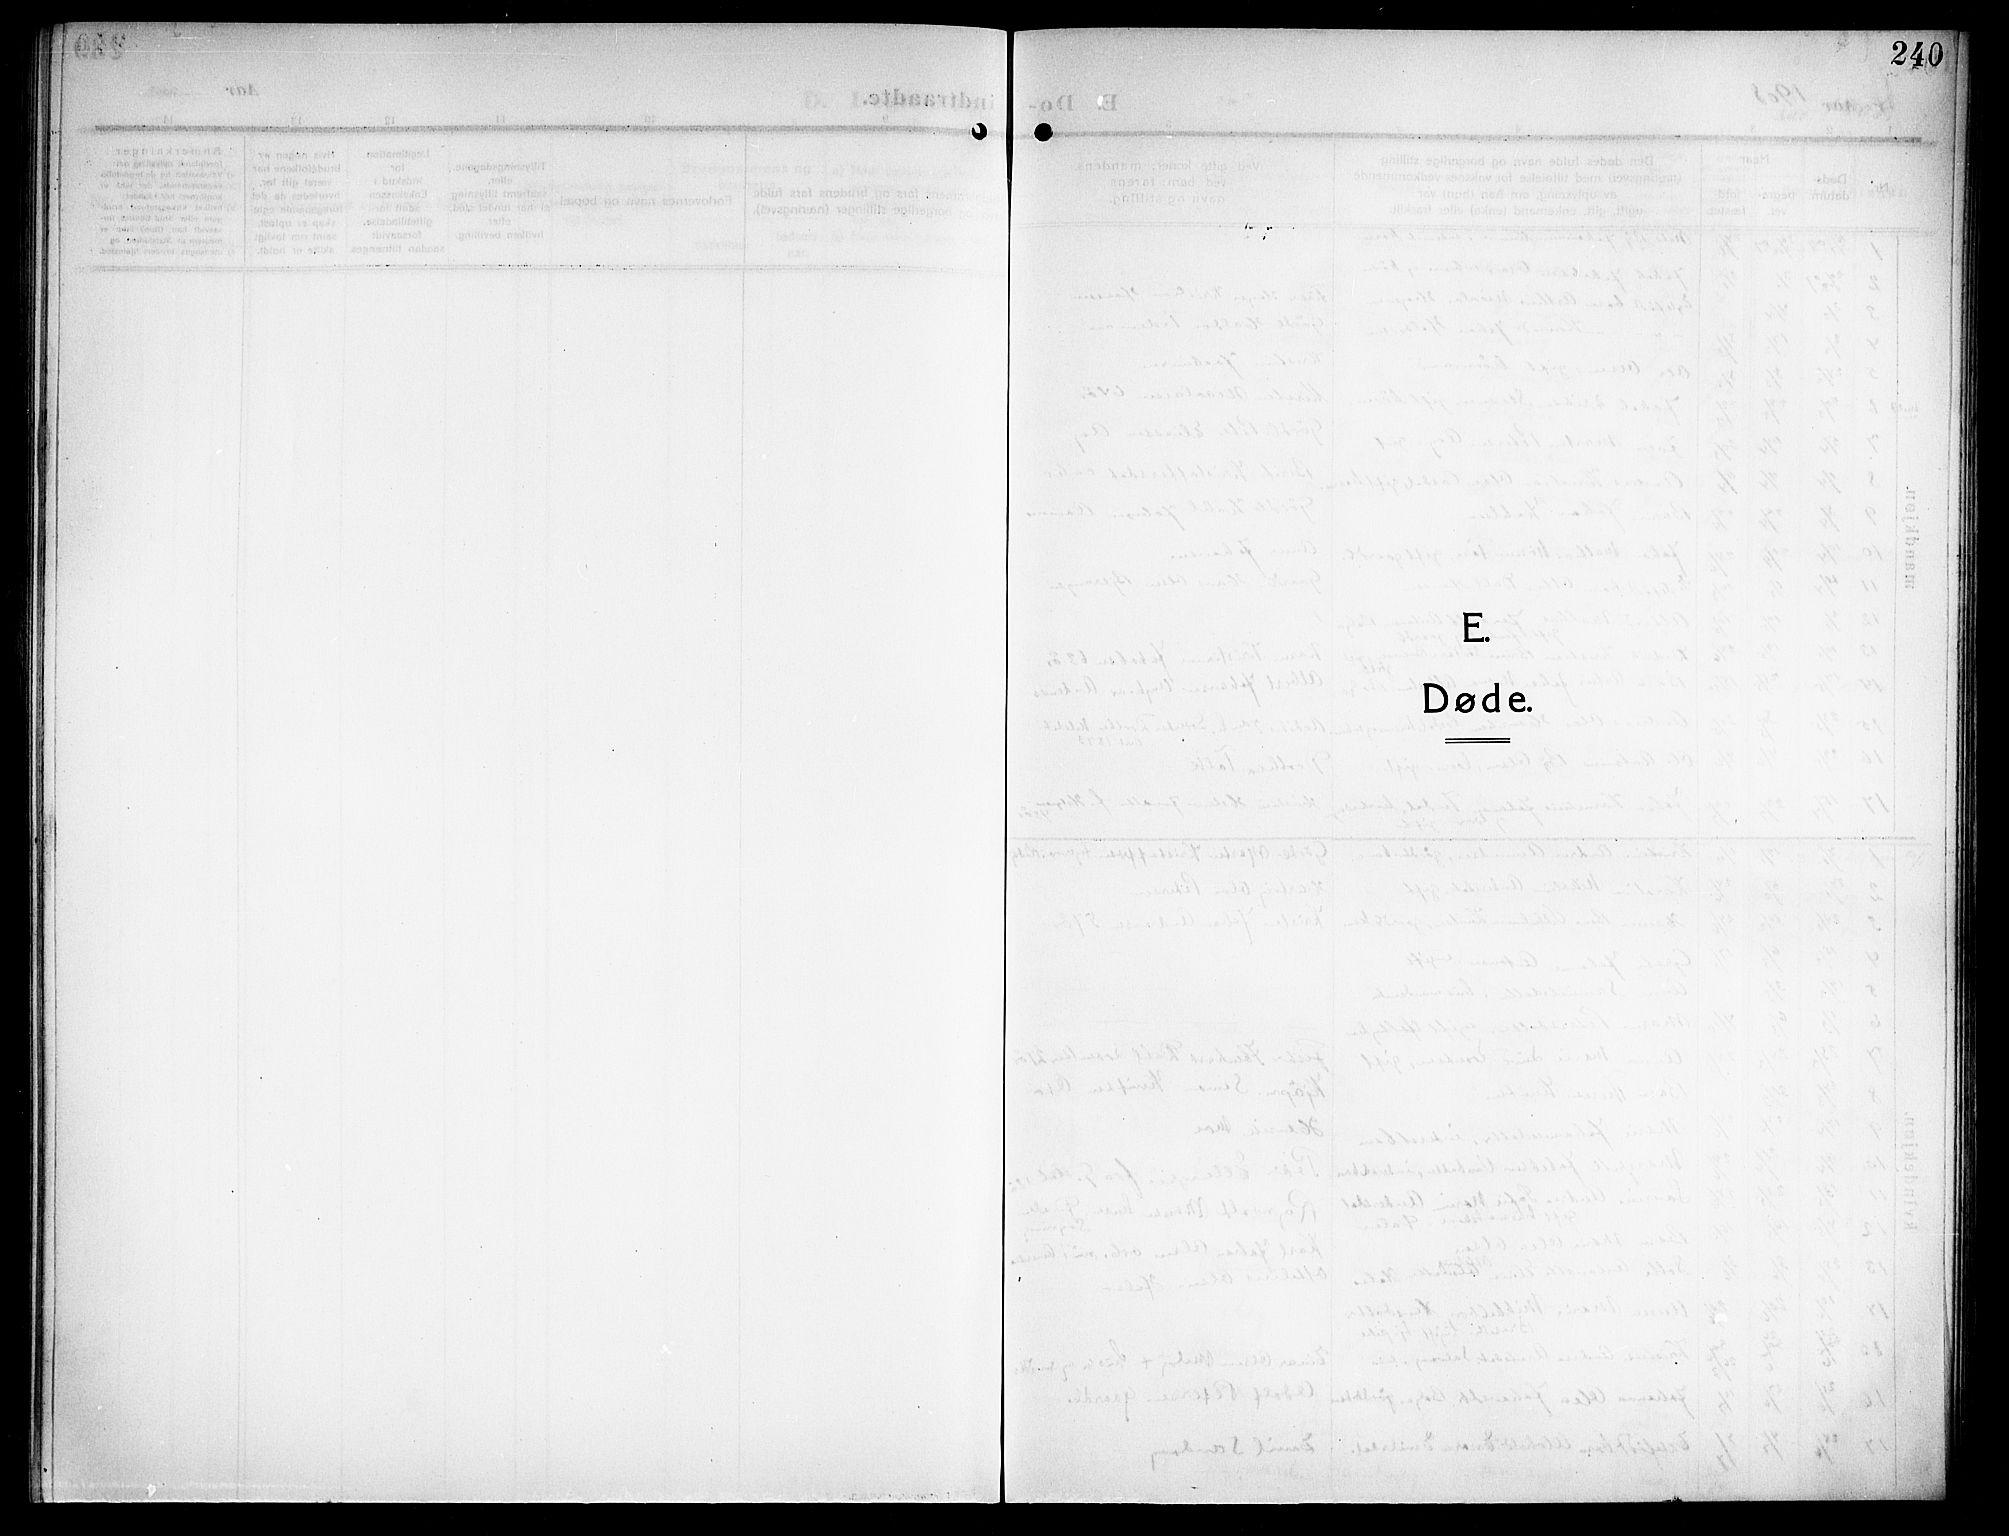 SAT, Ministerialprotokoller, klokkerbøker og fødselsregistre - Nordland, 843/L0639: Klokkerbok nr. 843C08, 1908-1924, s. 240